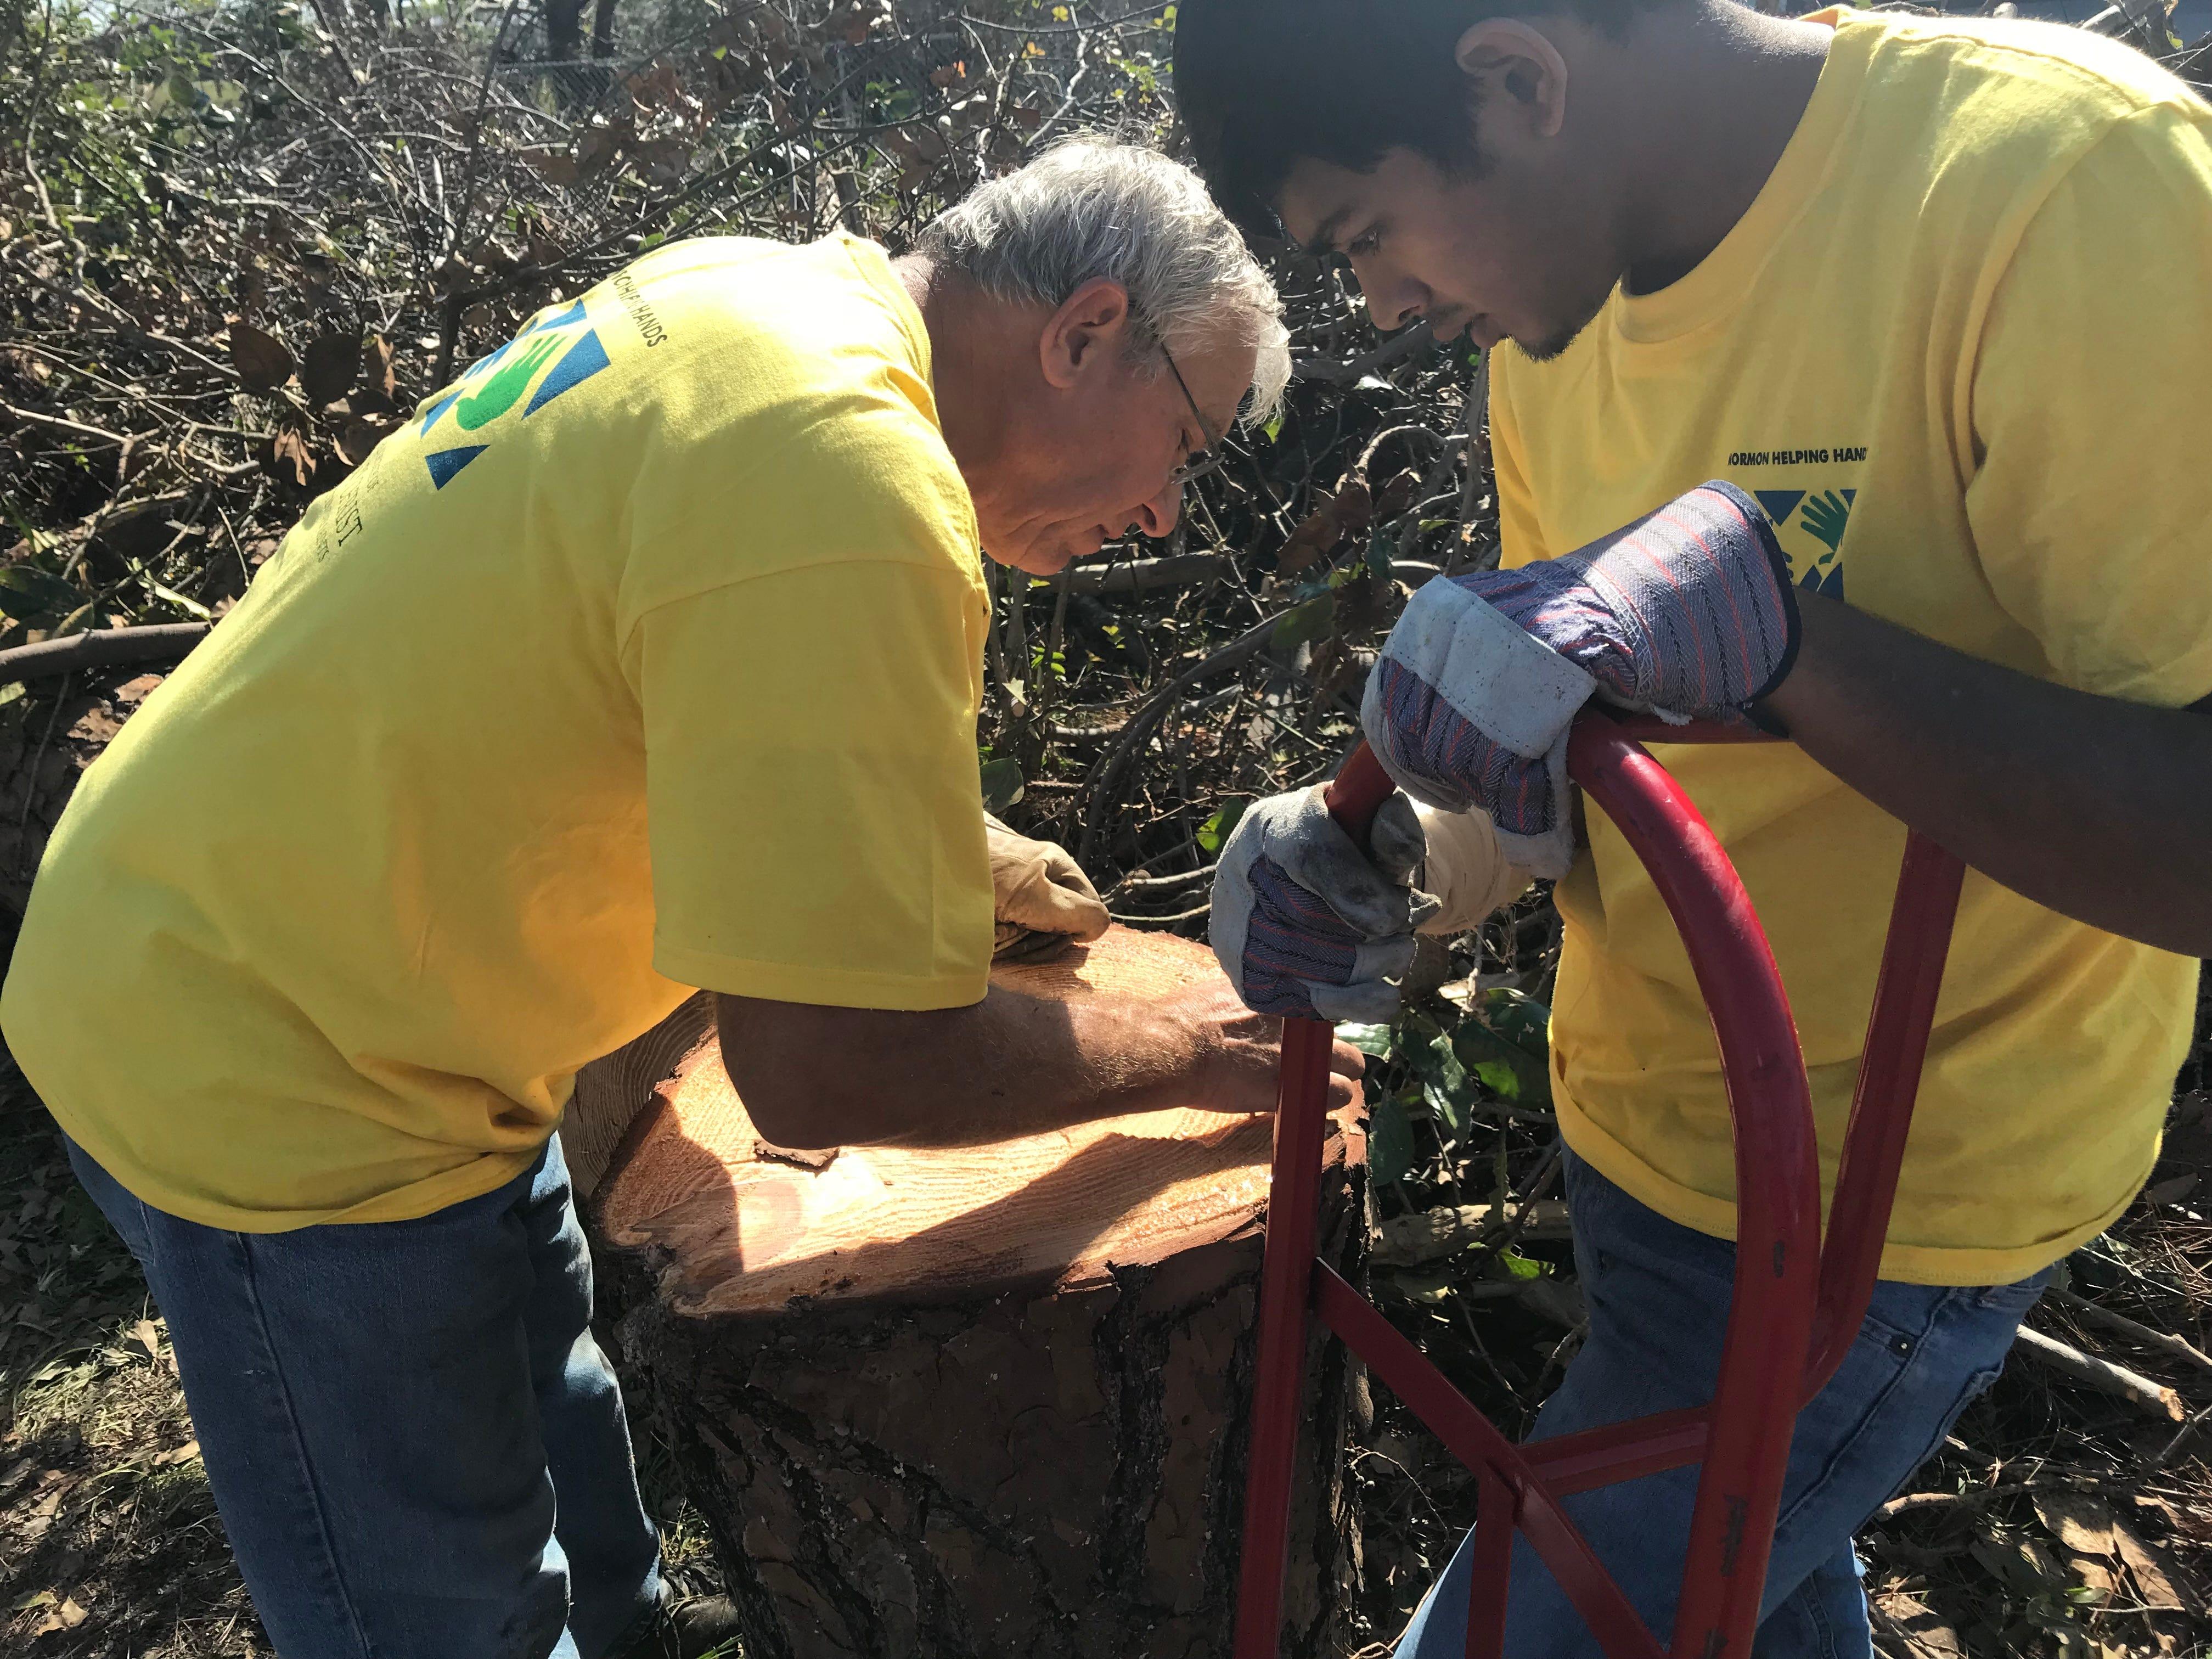 George Edge counts tree rings on a freshly cut tree stump.